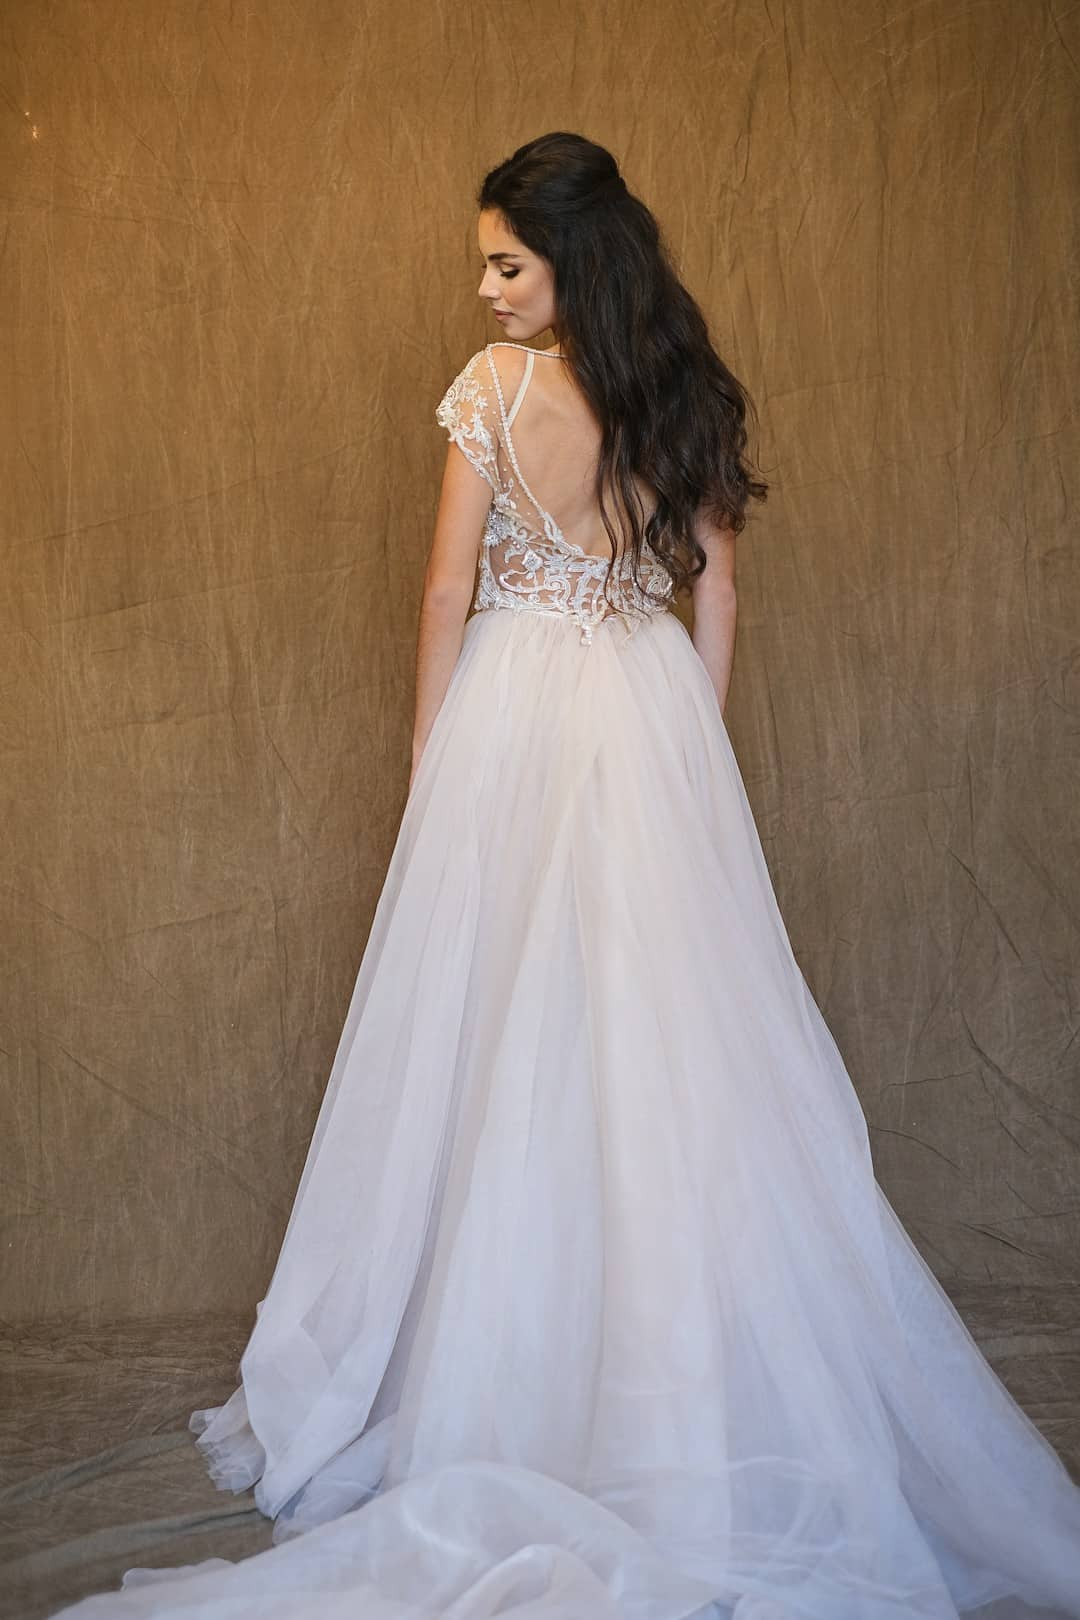 Haute Couture Wedding Dresses - Galia Lahav - Gala 607 - back